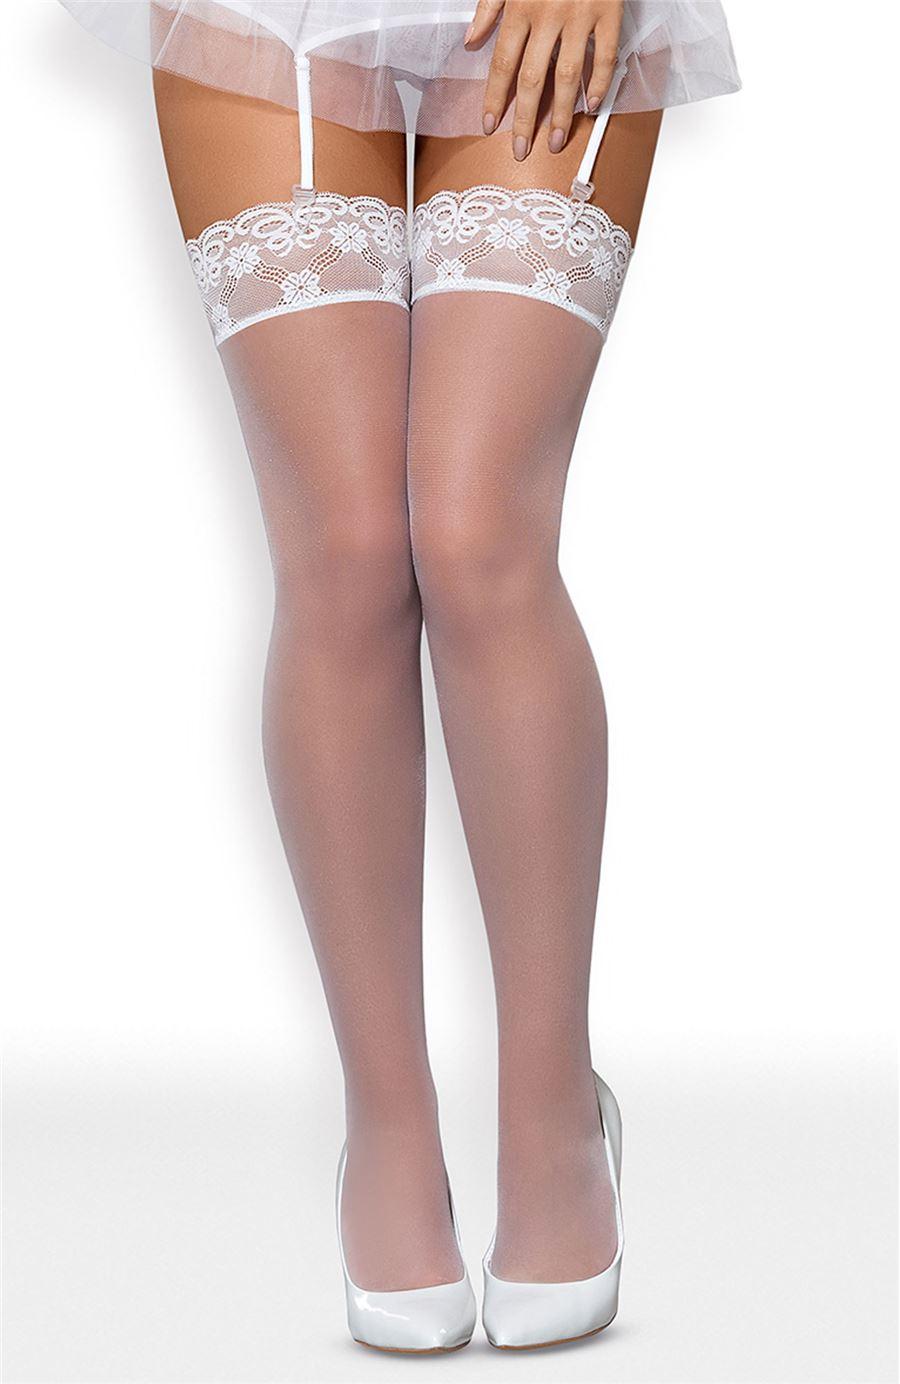 Julitta stockings